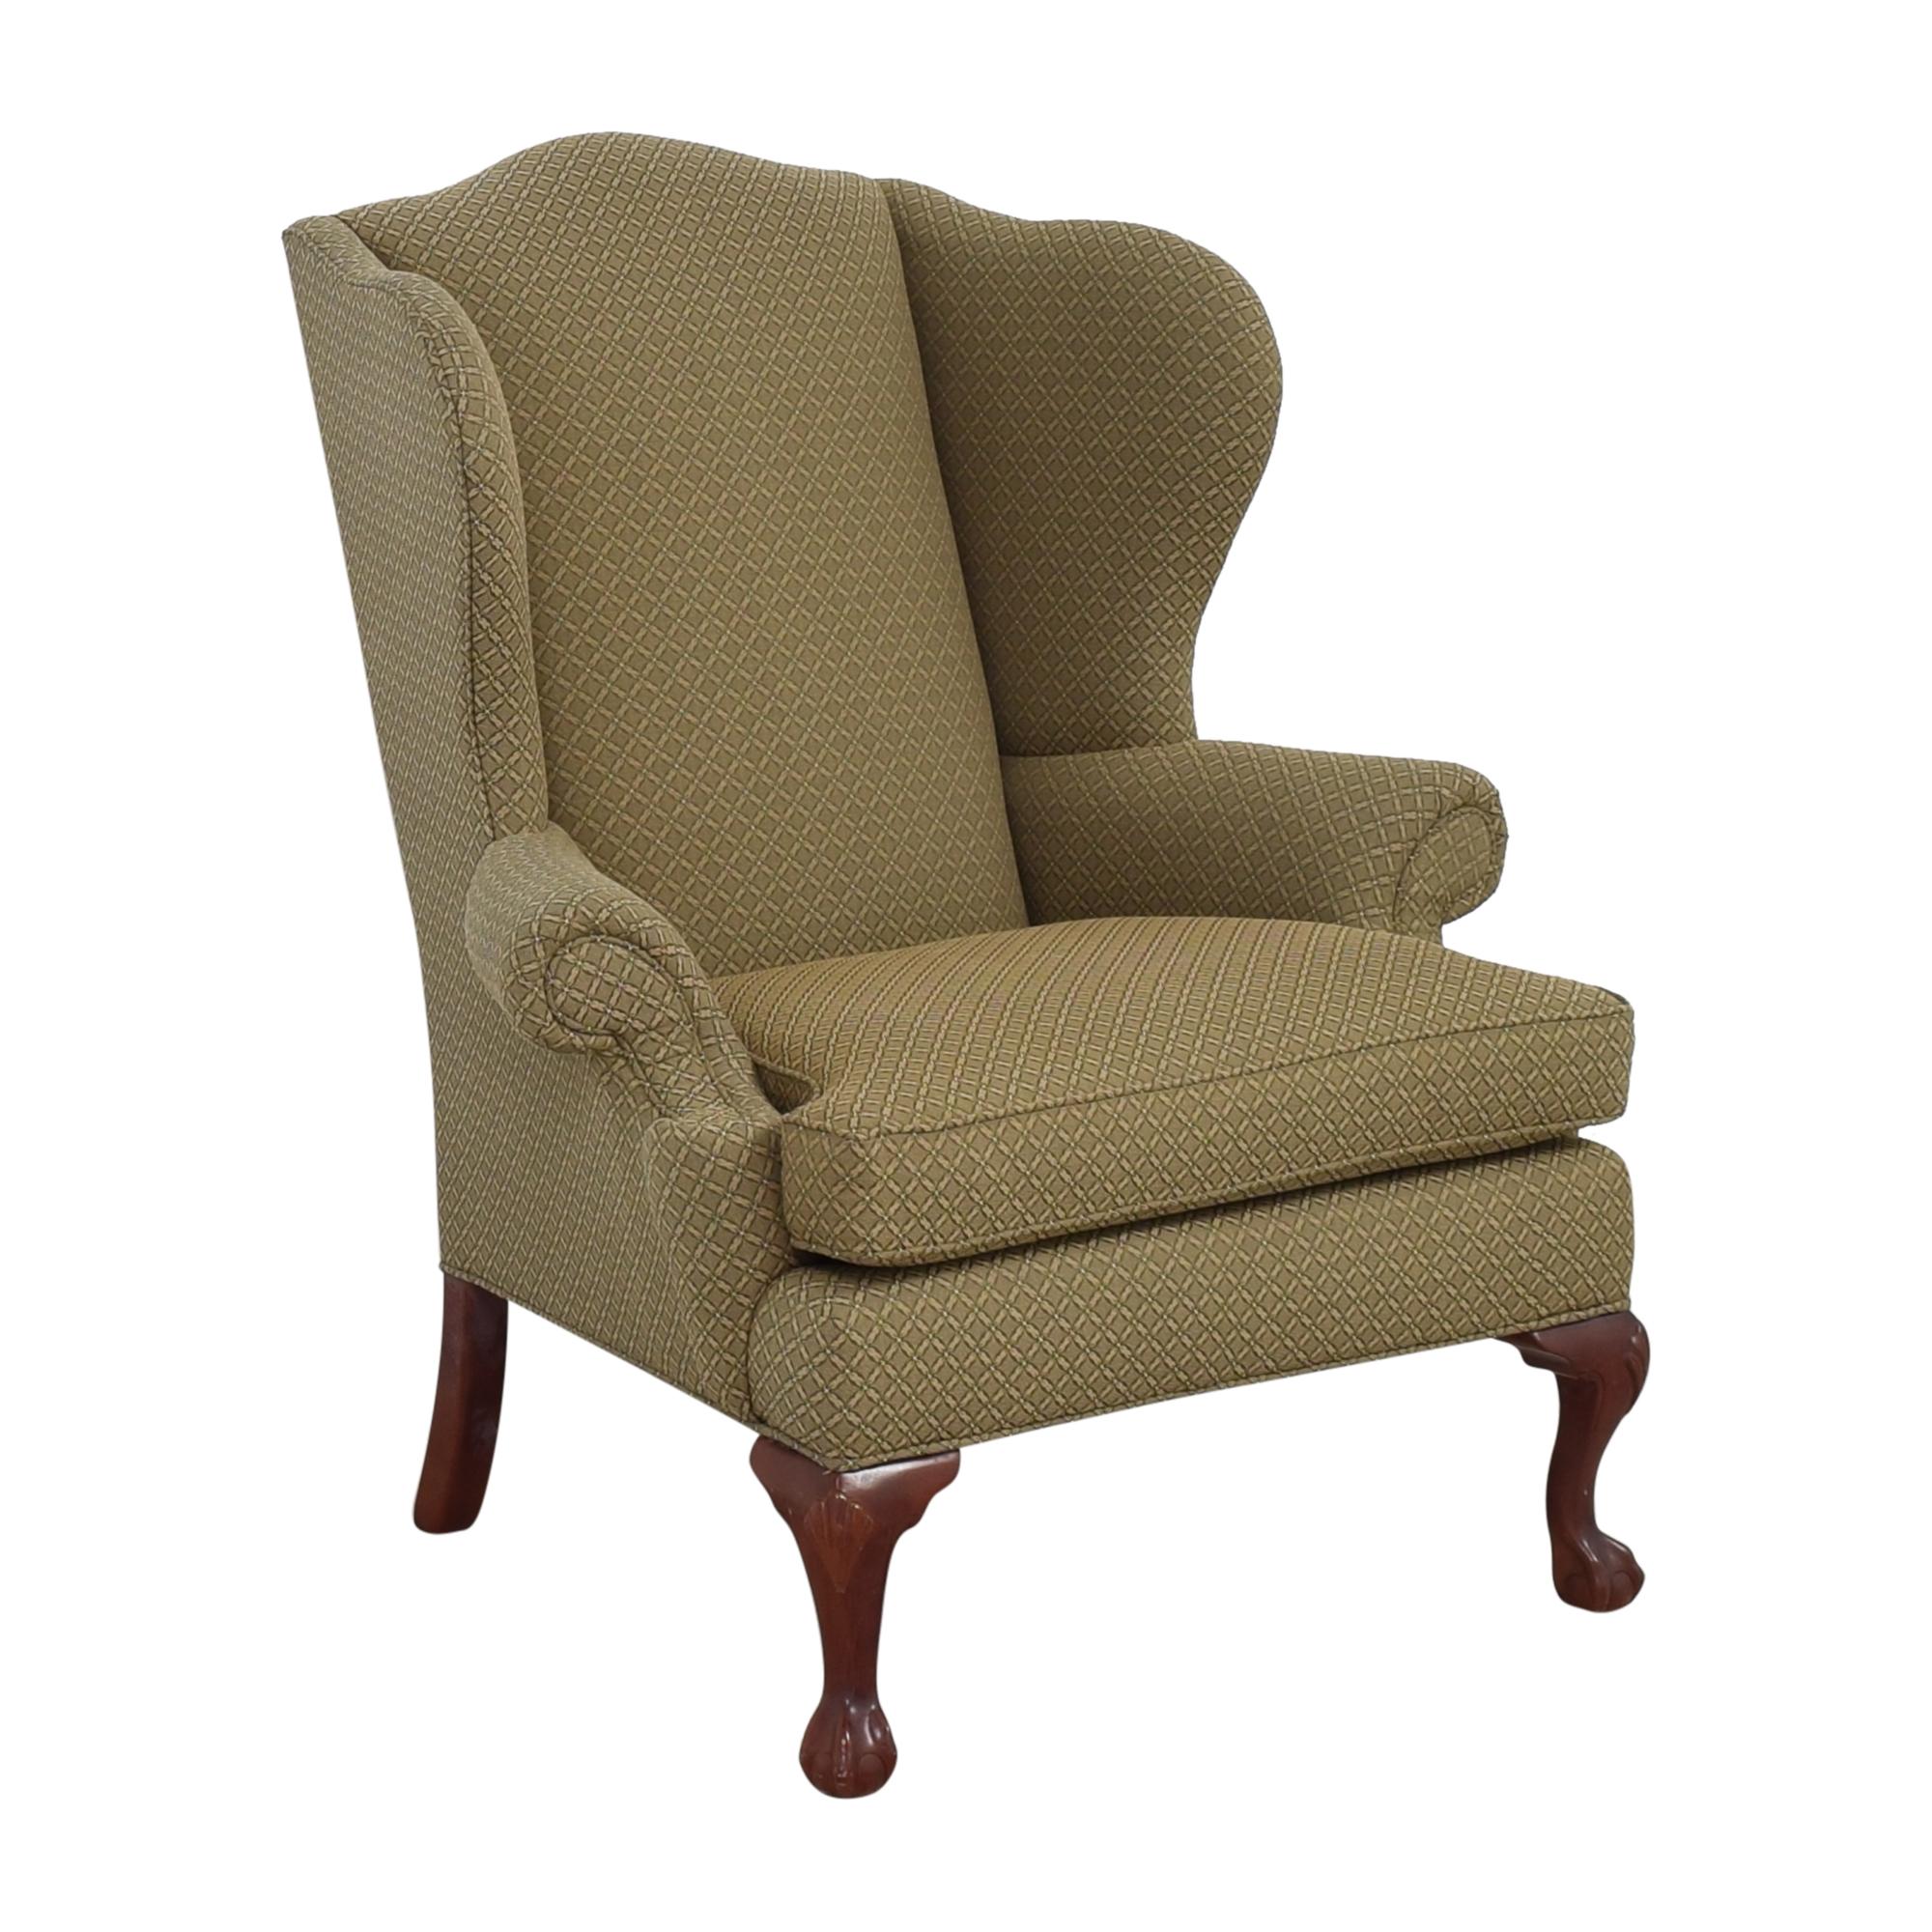 Ethan Allen Ethan Allen Giles Chair